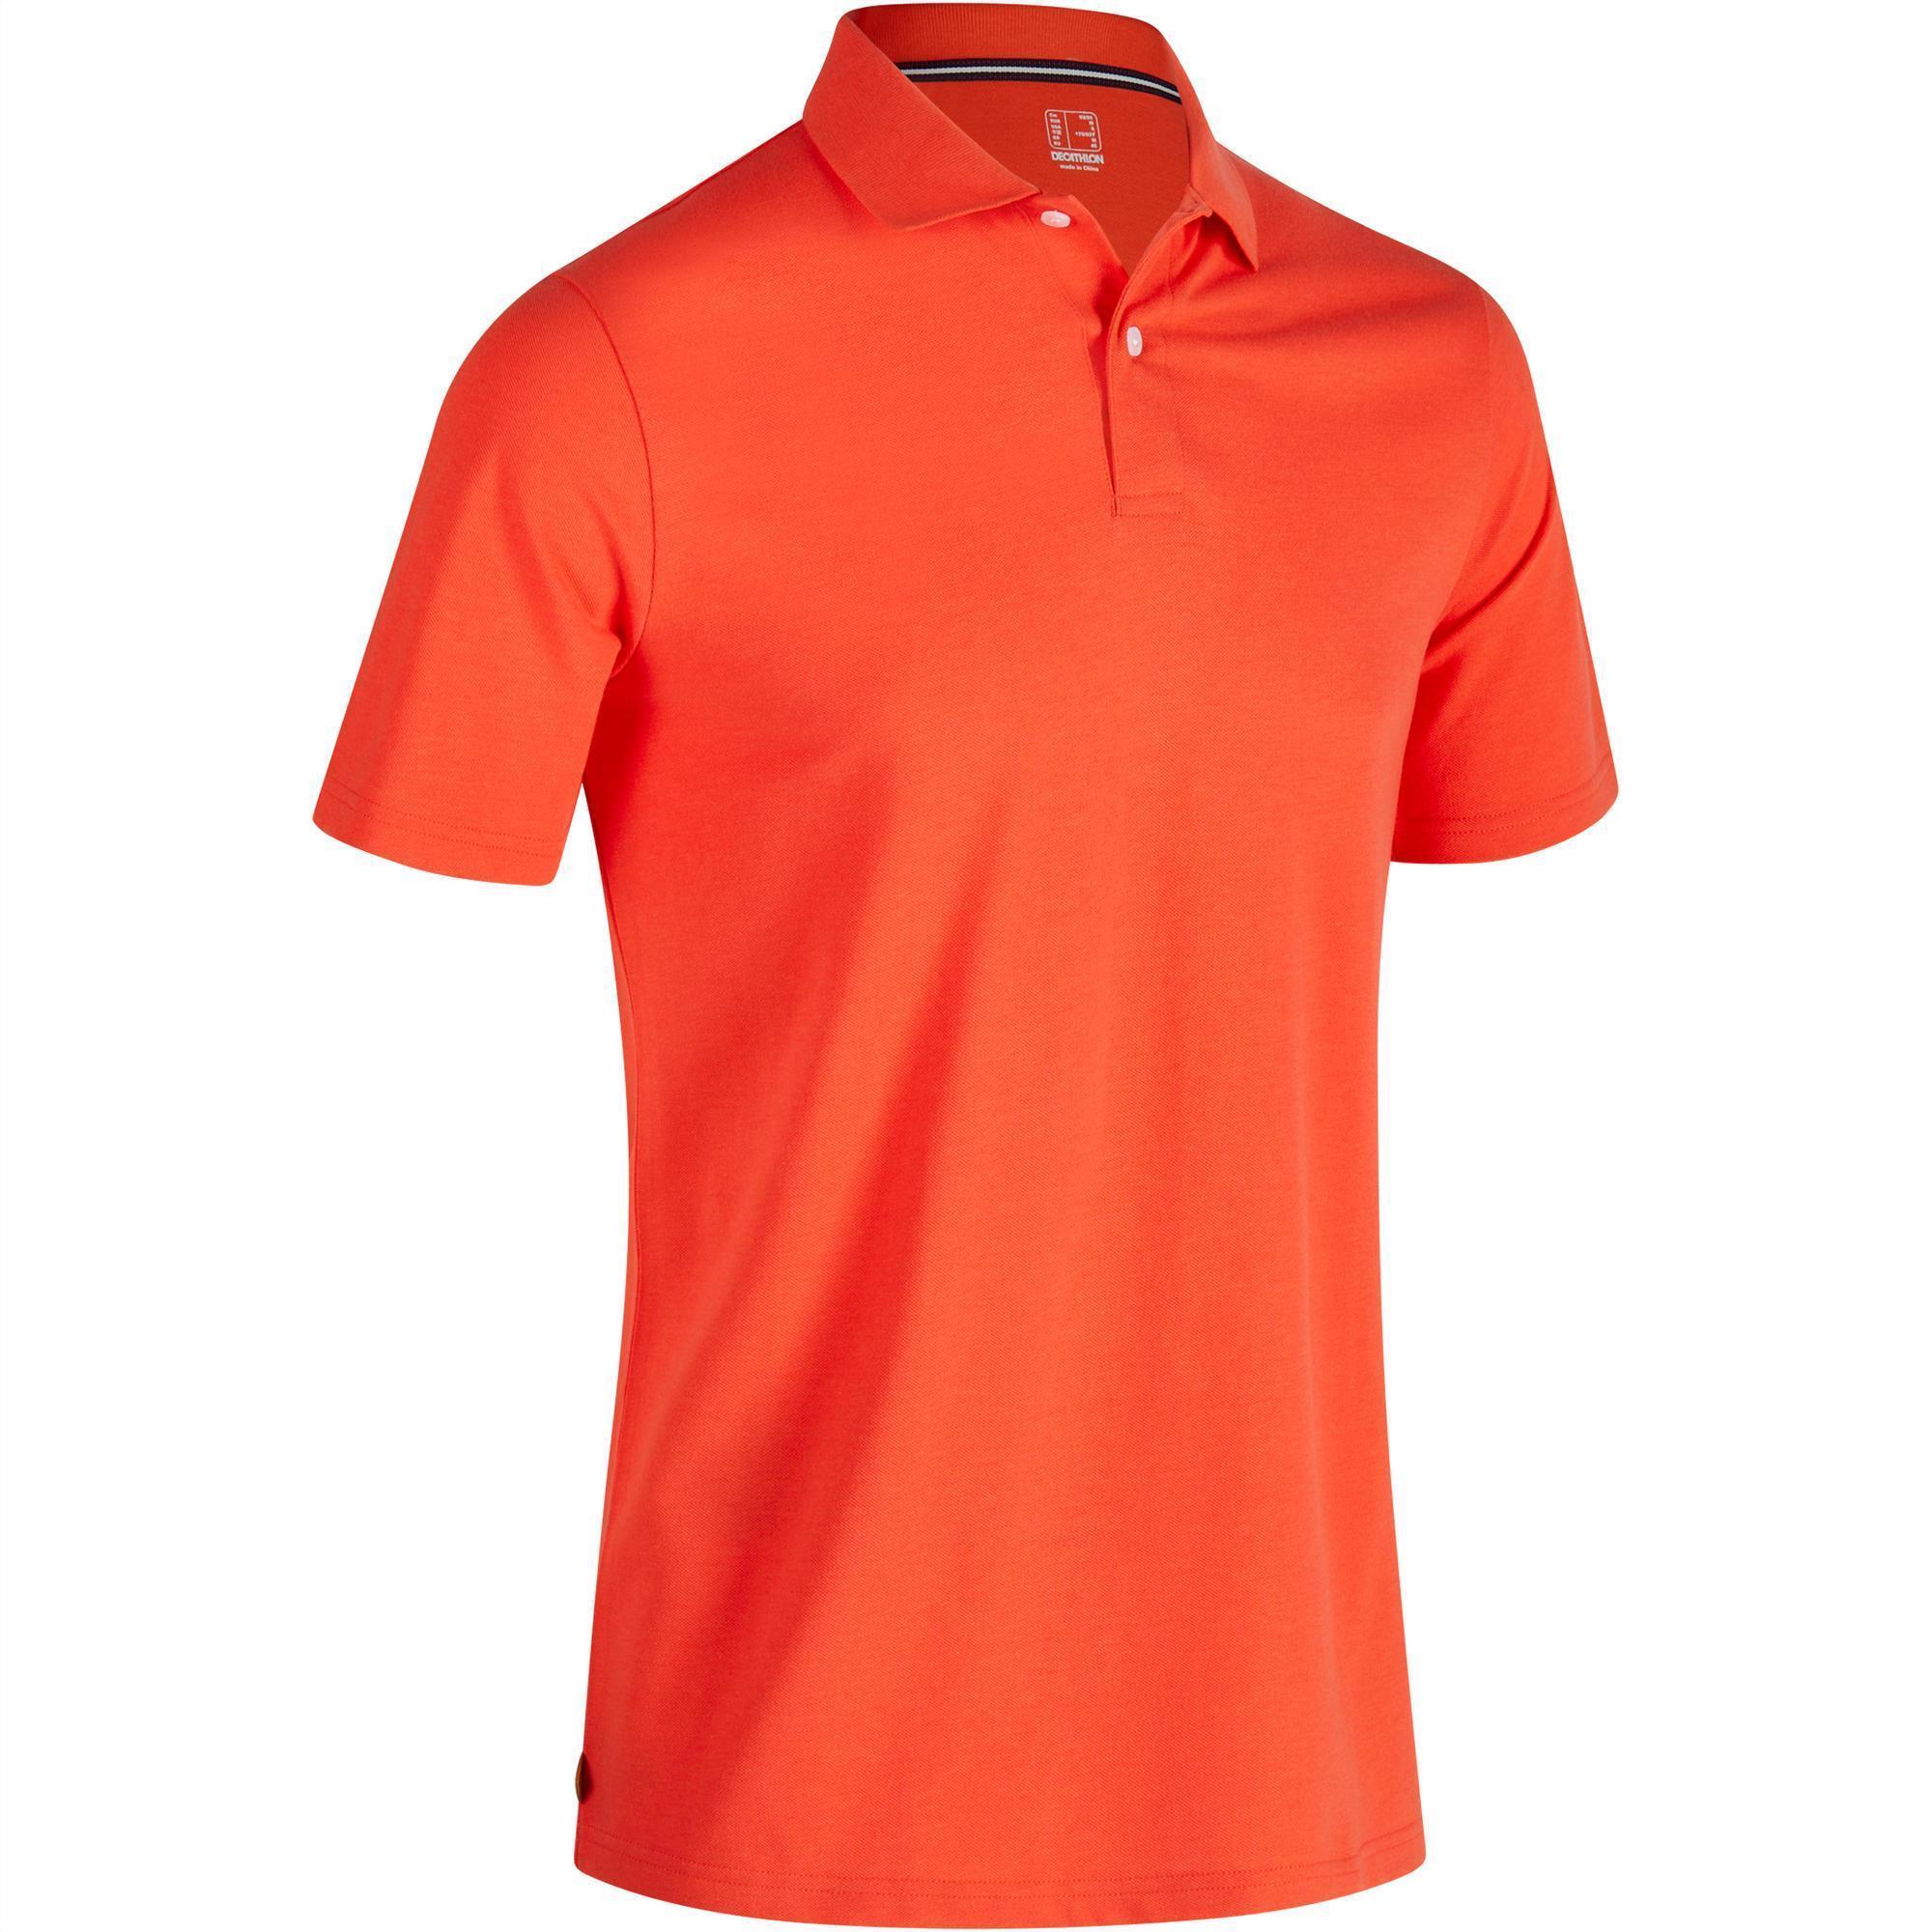 polo de golf homme manches courtes 500 temps chaud rouge inesis golf. Black Bedroom Furniture Sets. Home Design Ideas